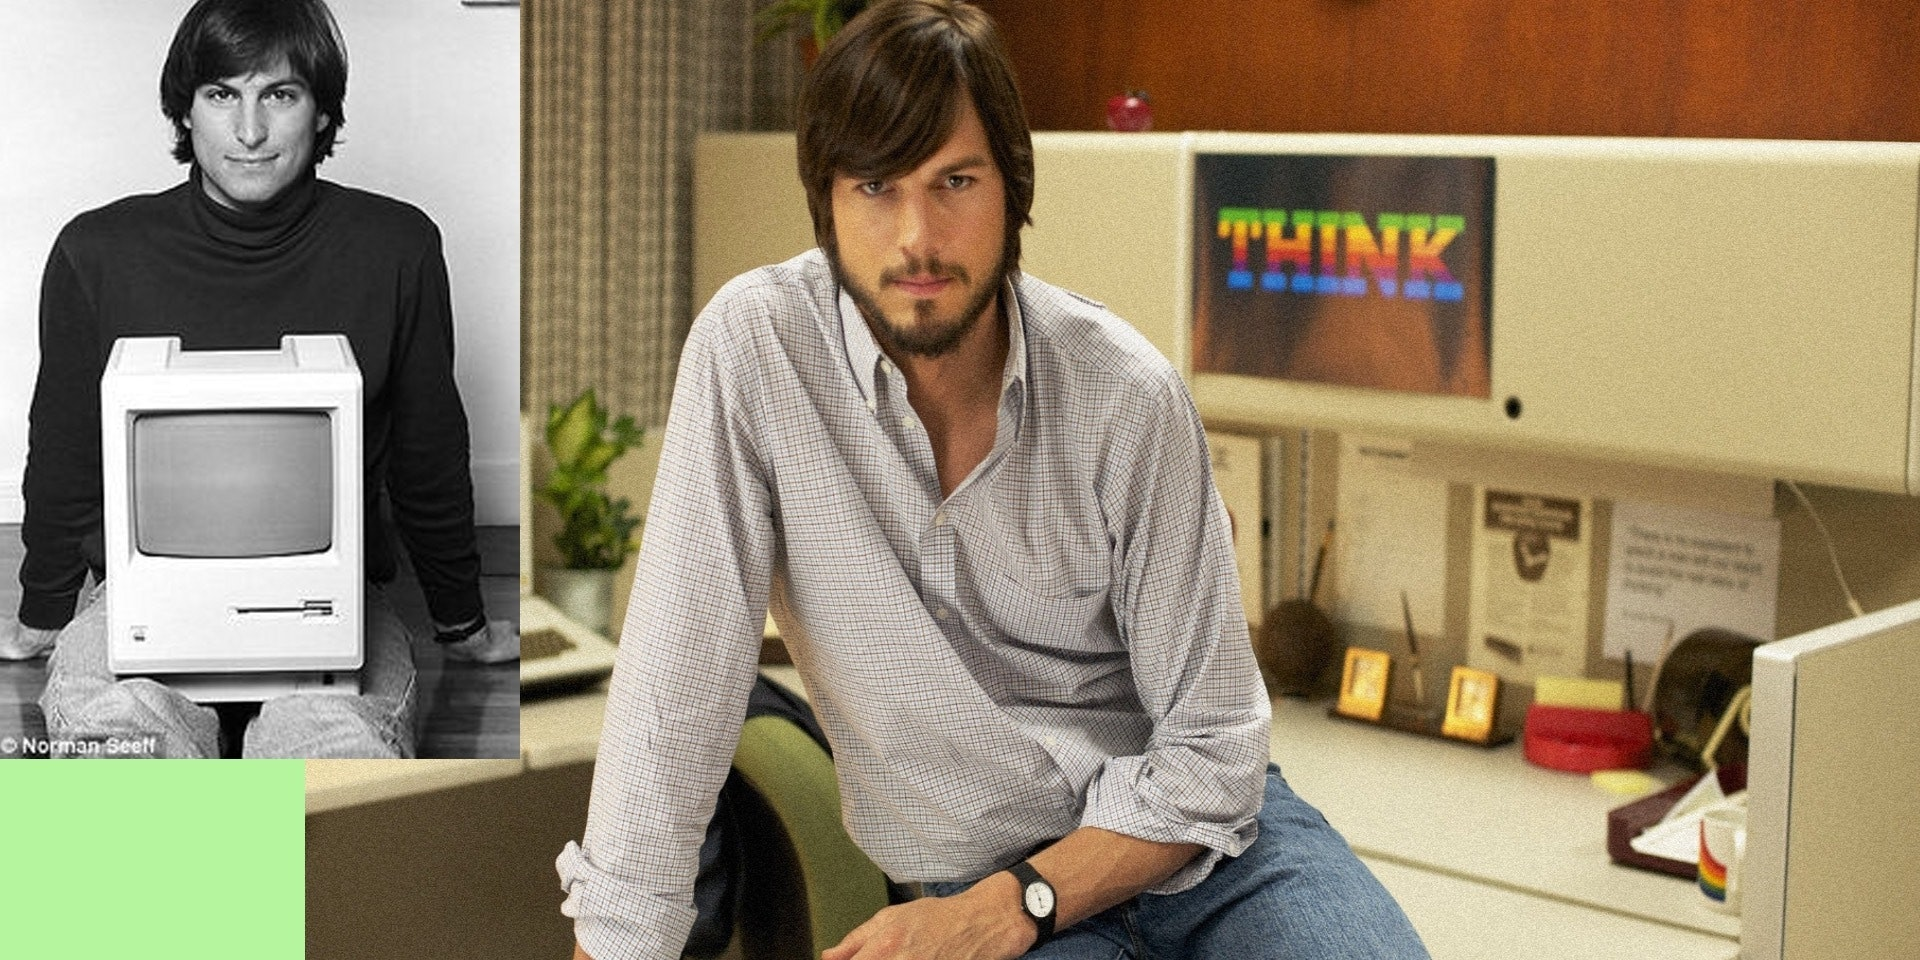 Steve Jobs / Ashton Kutcher